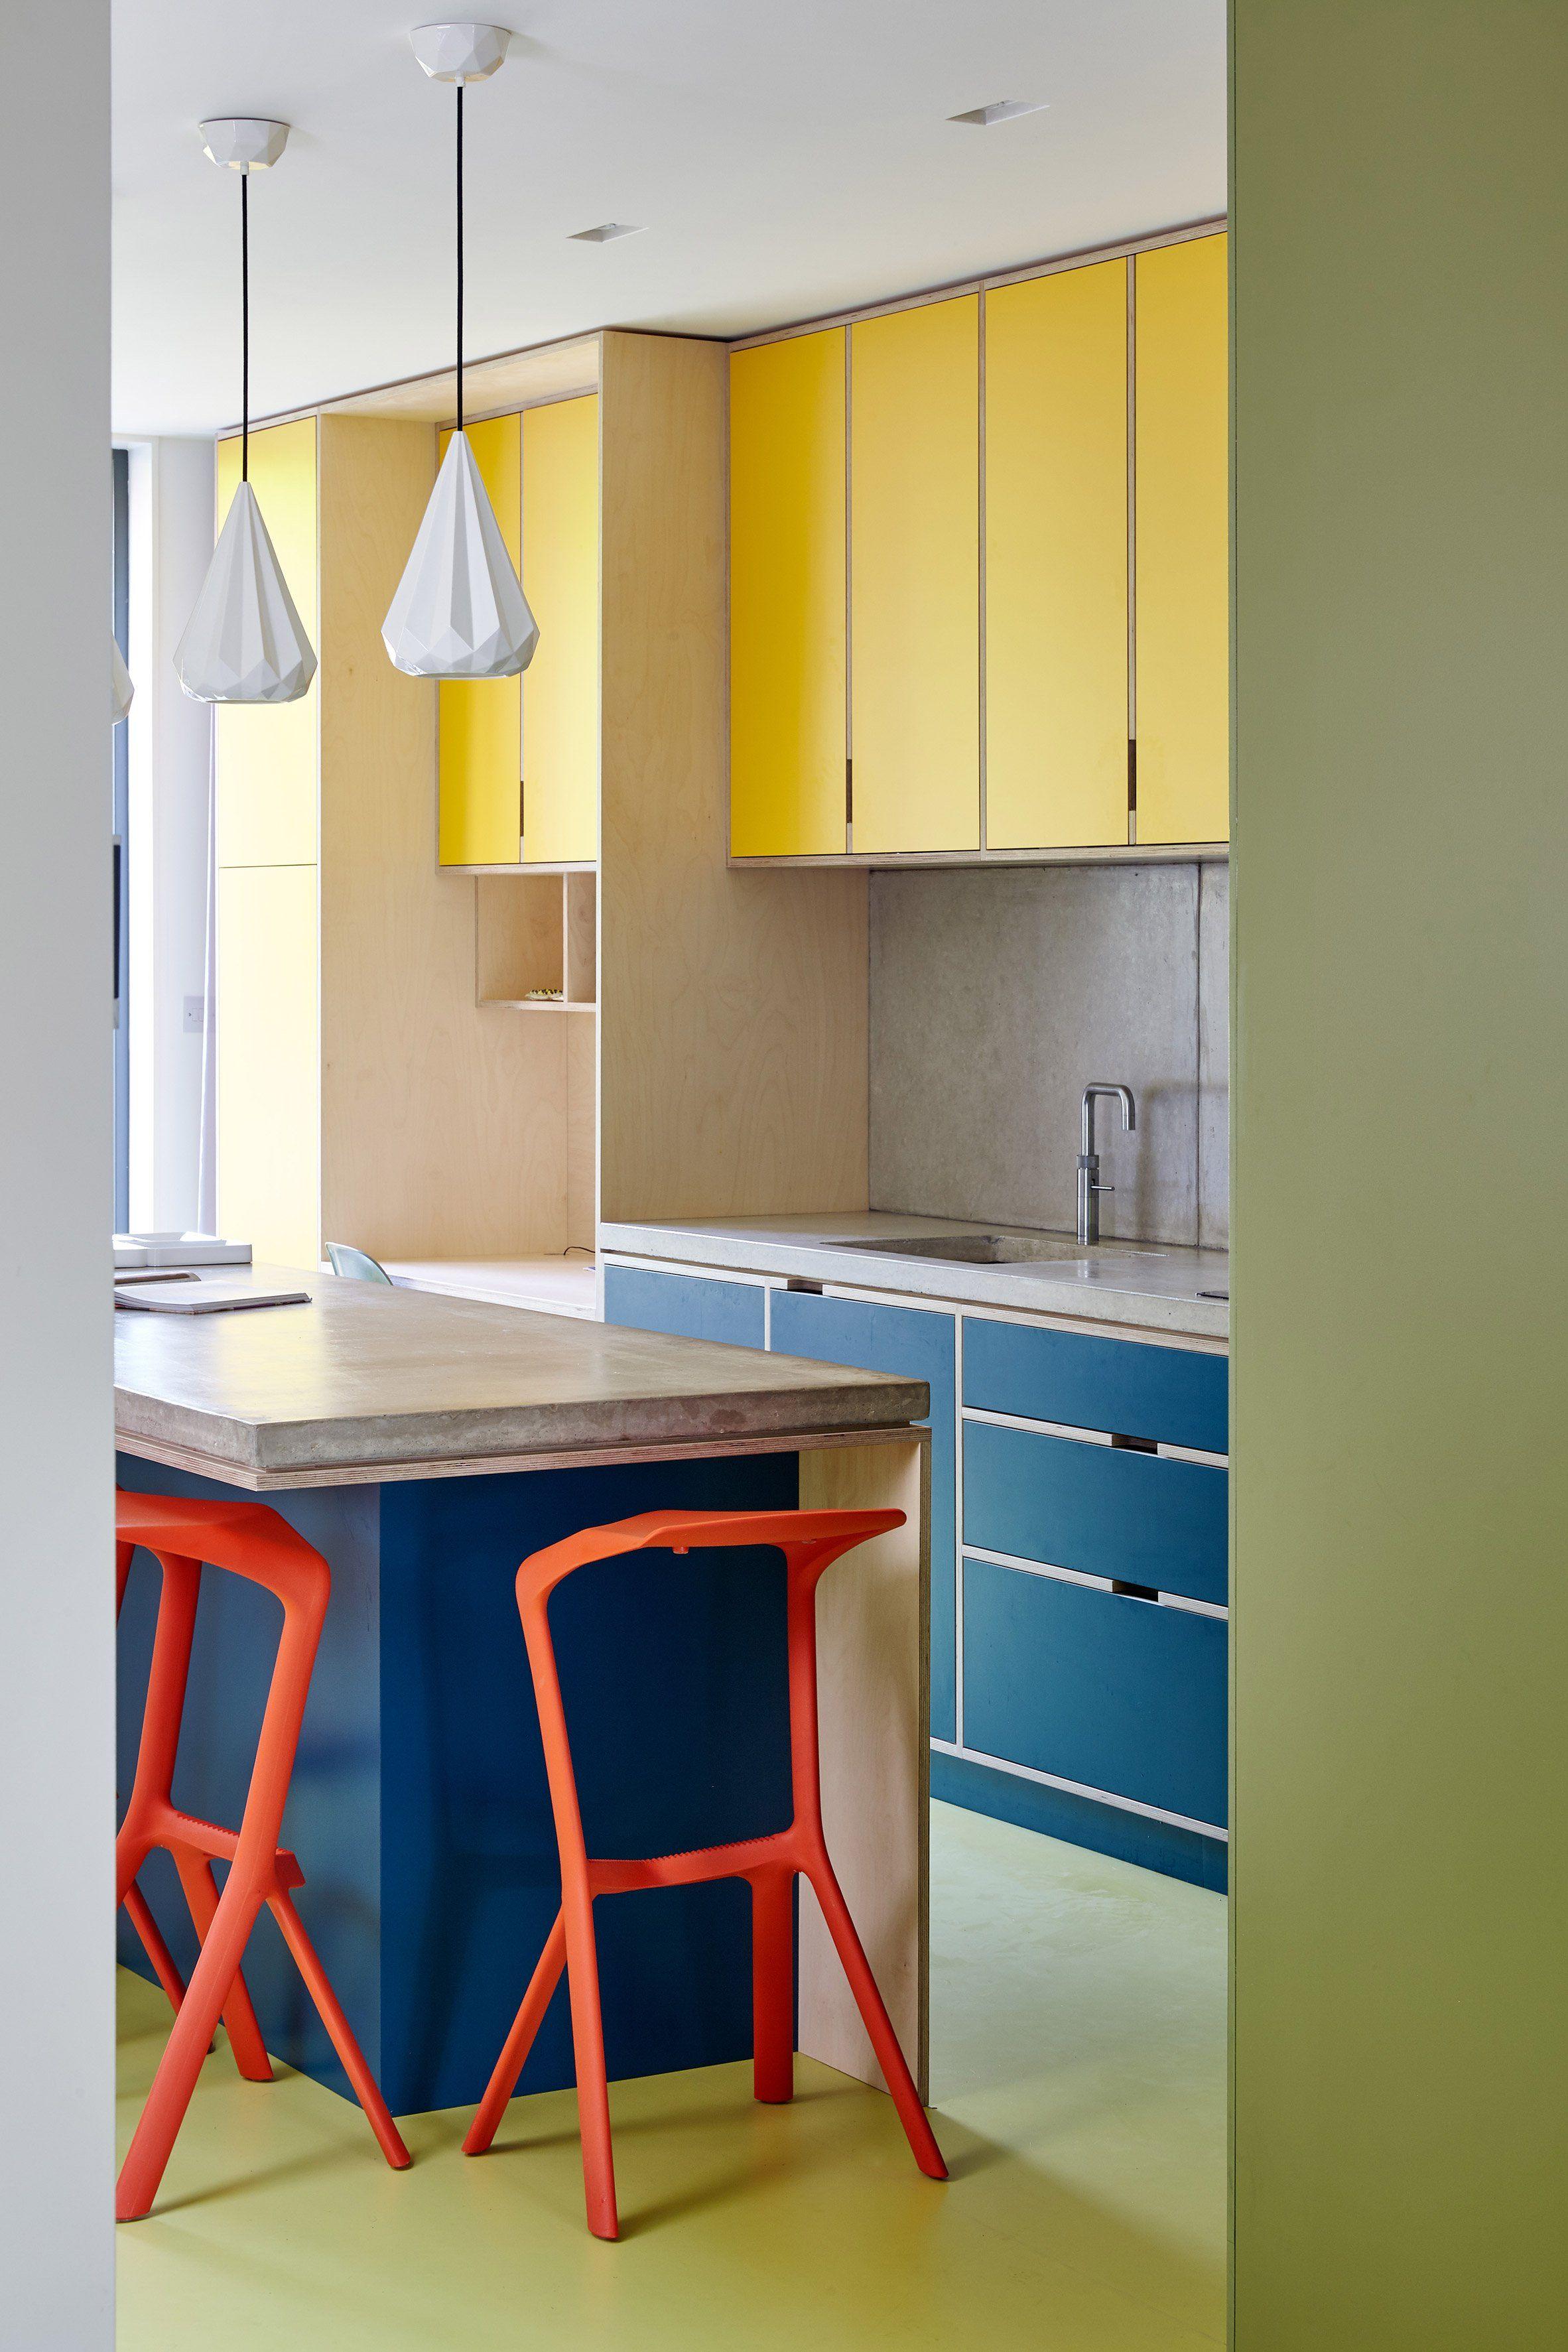 R studio enlivens victorian london home with bold colour palette